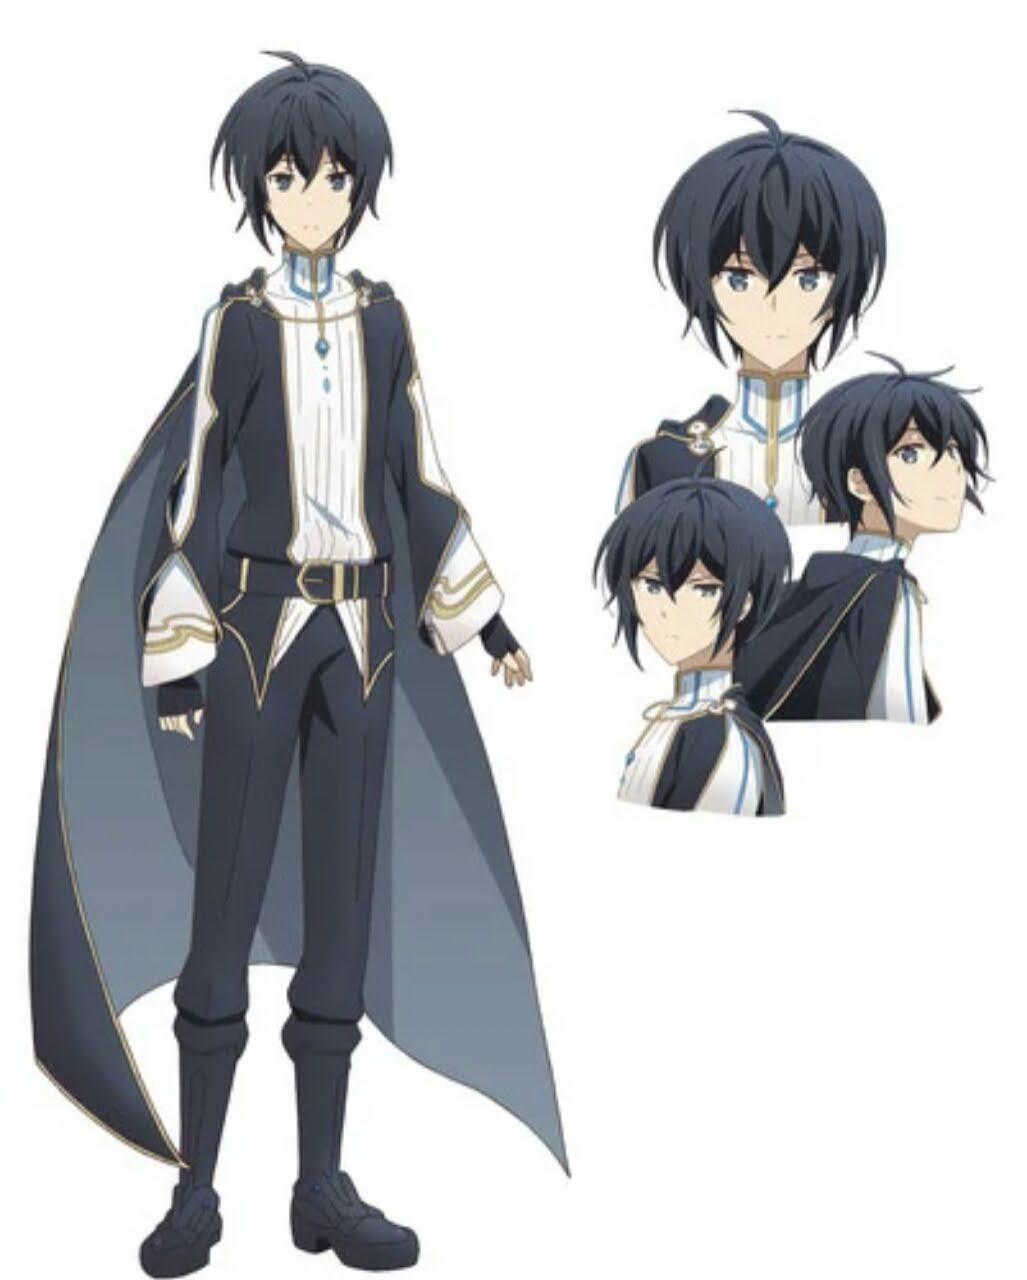 Video Promosi Pertama Anime Our Last Crusade or the Rise of a New World Ungkap Seiyuu Animenya 2